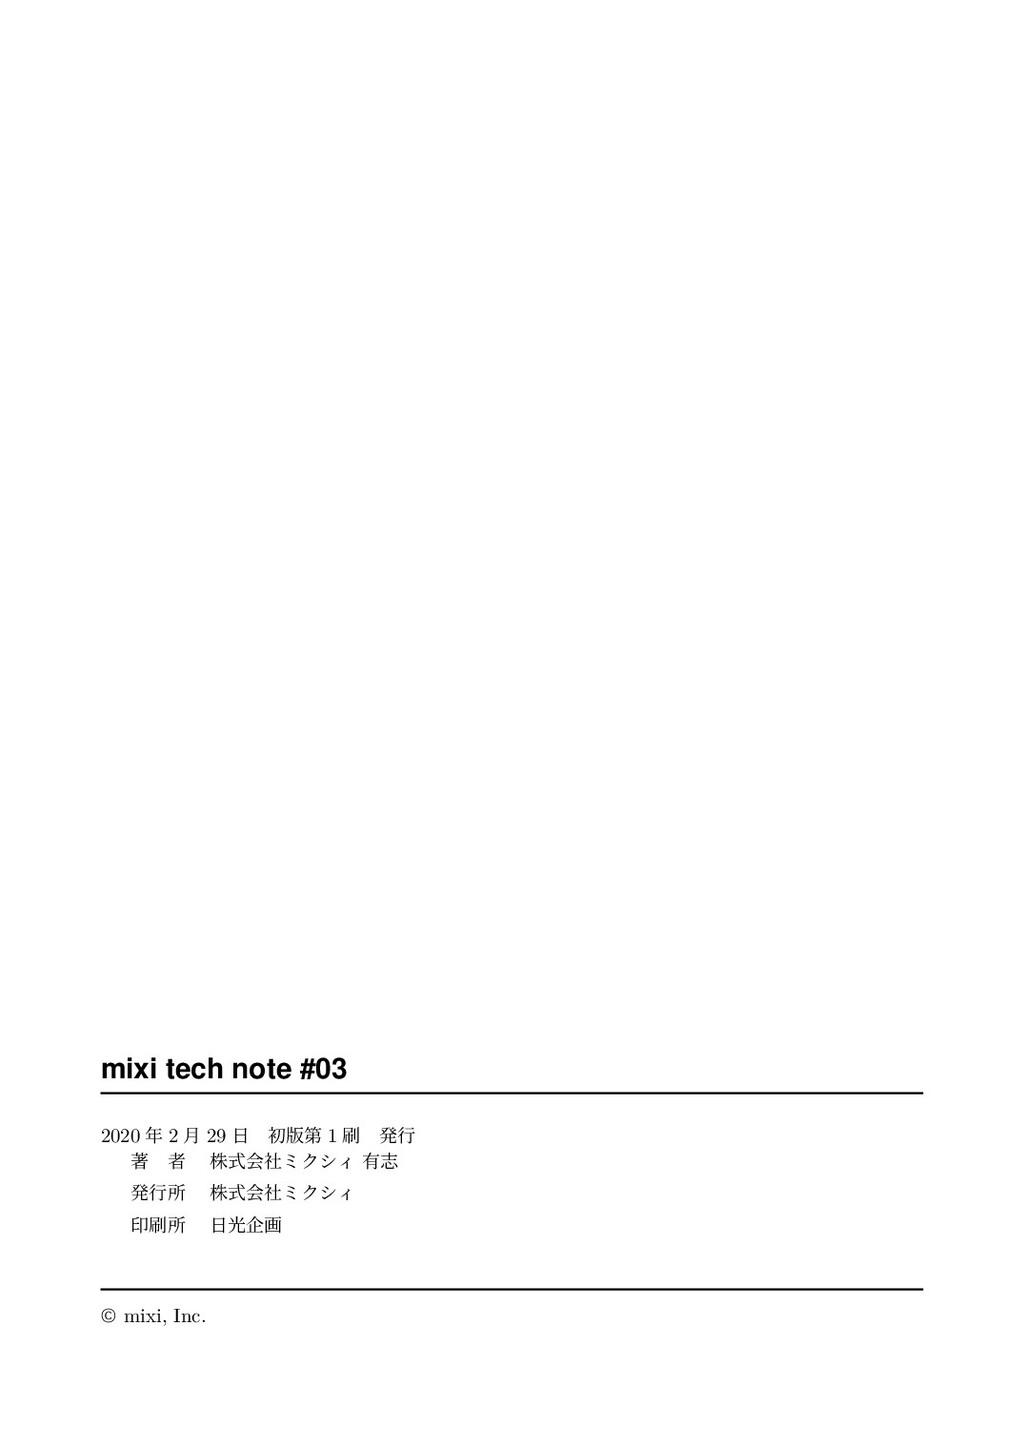 mixi tech note #03 2020  2 ݄ 29 ɹॳ൛ୈ 1 ɹൃߦ ஶ...